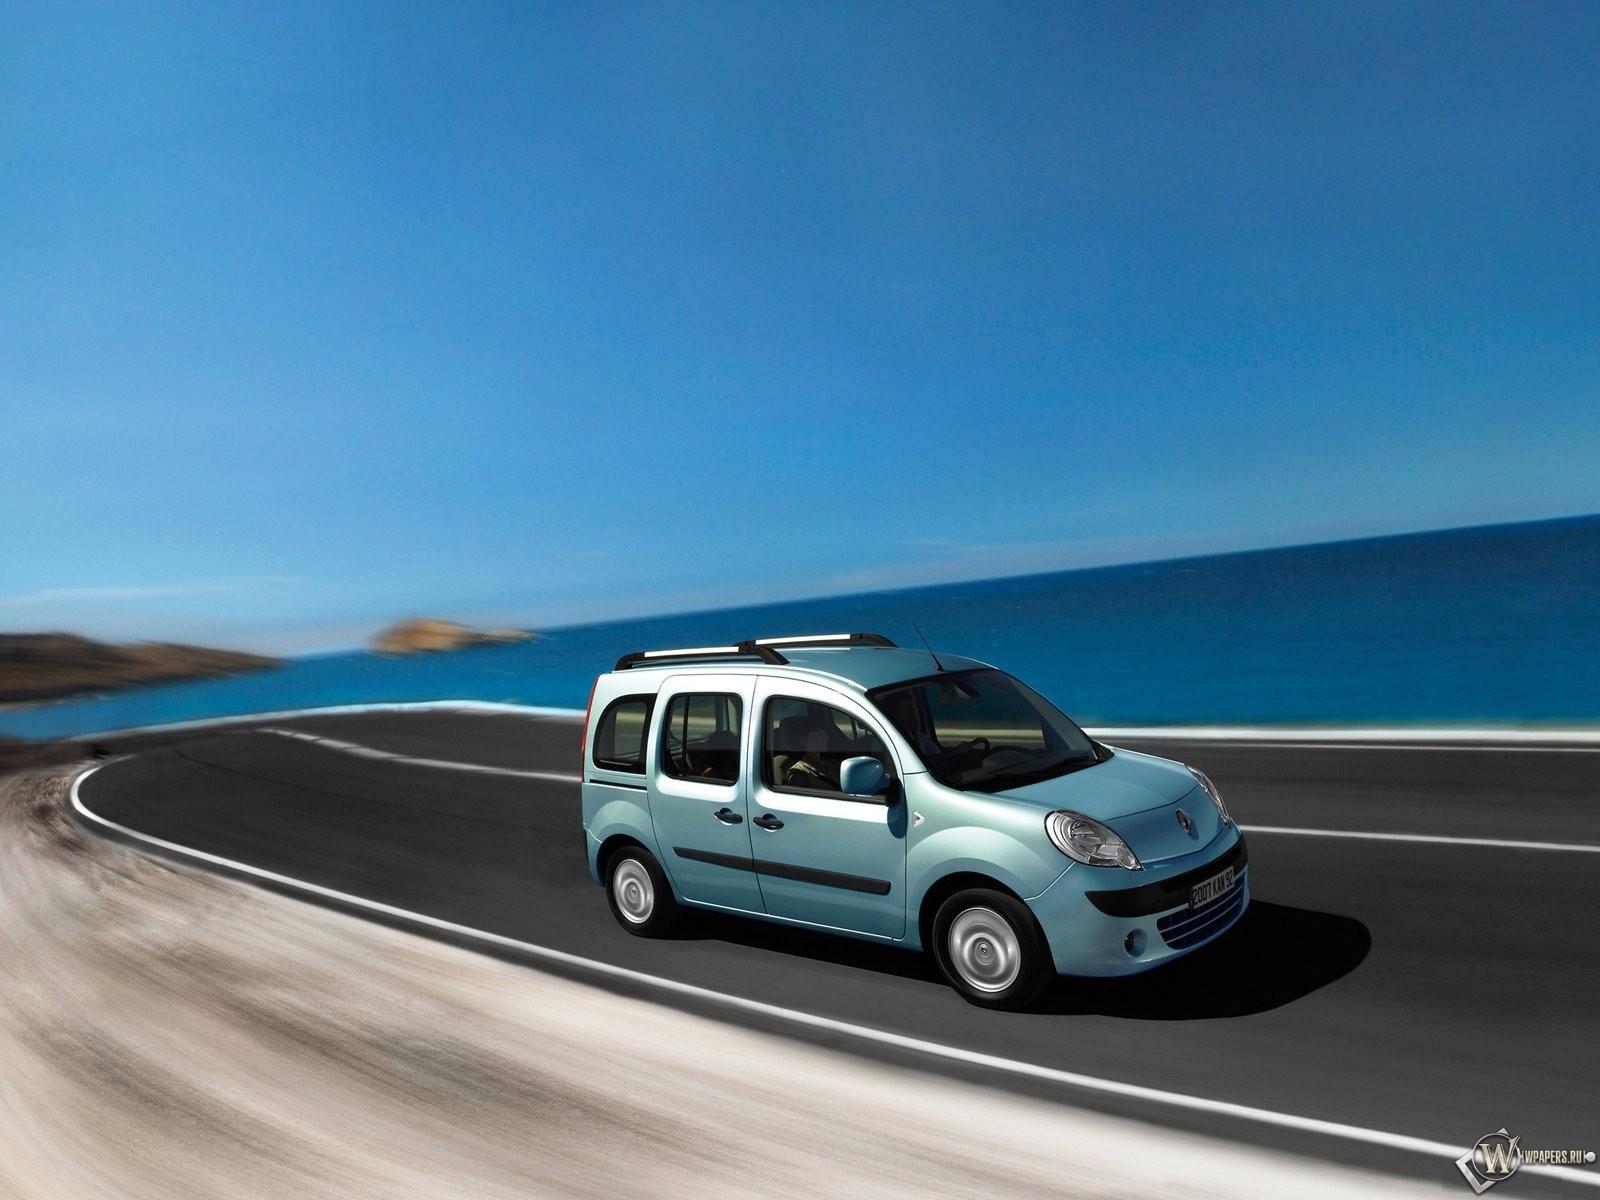 Фотографии Renault Kangoo Фотография #29 Фото Renault Kangoo.